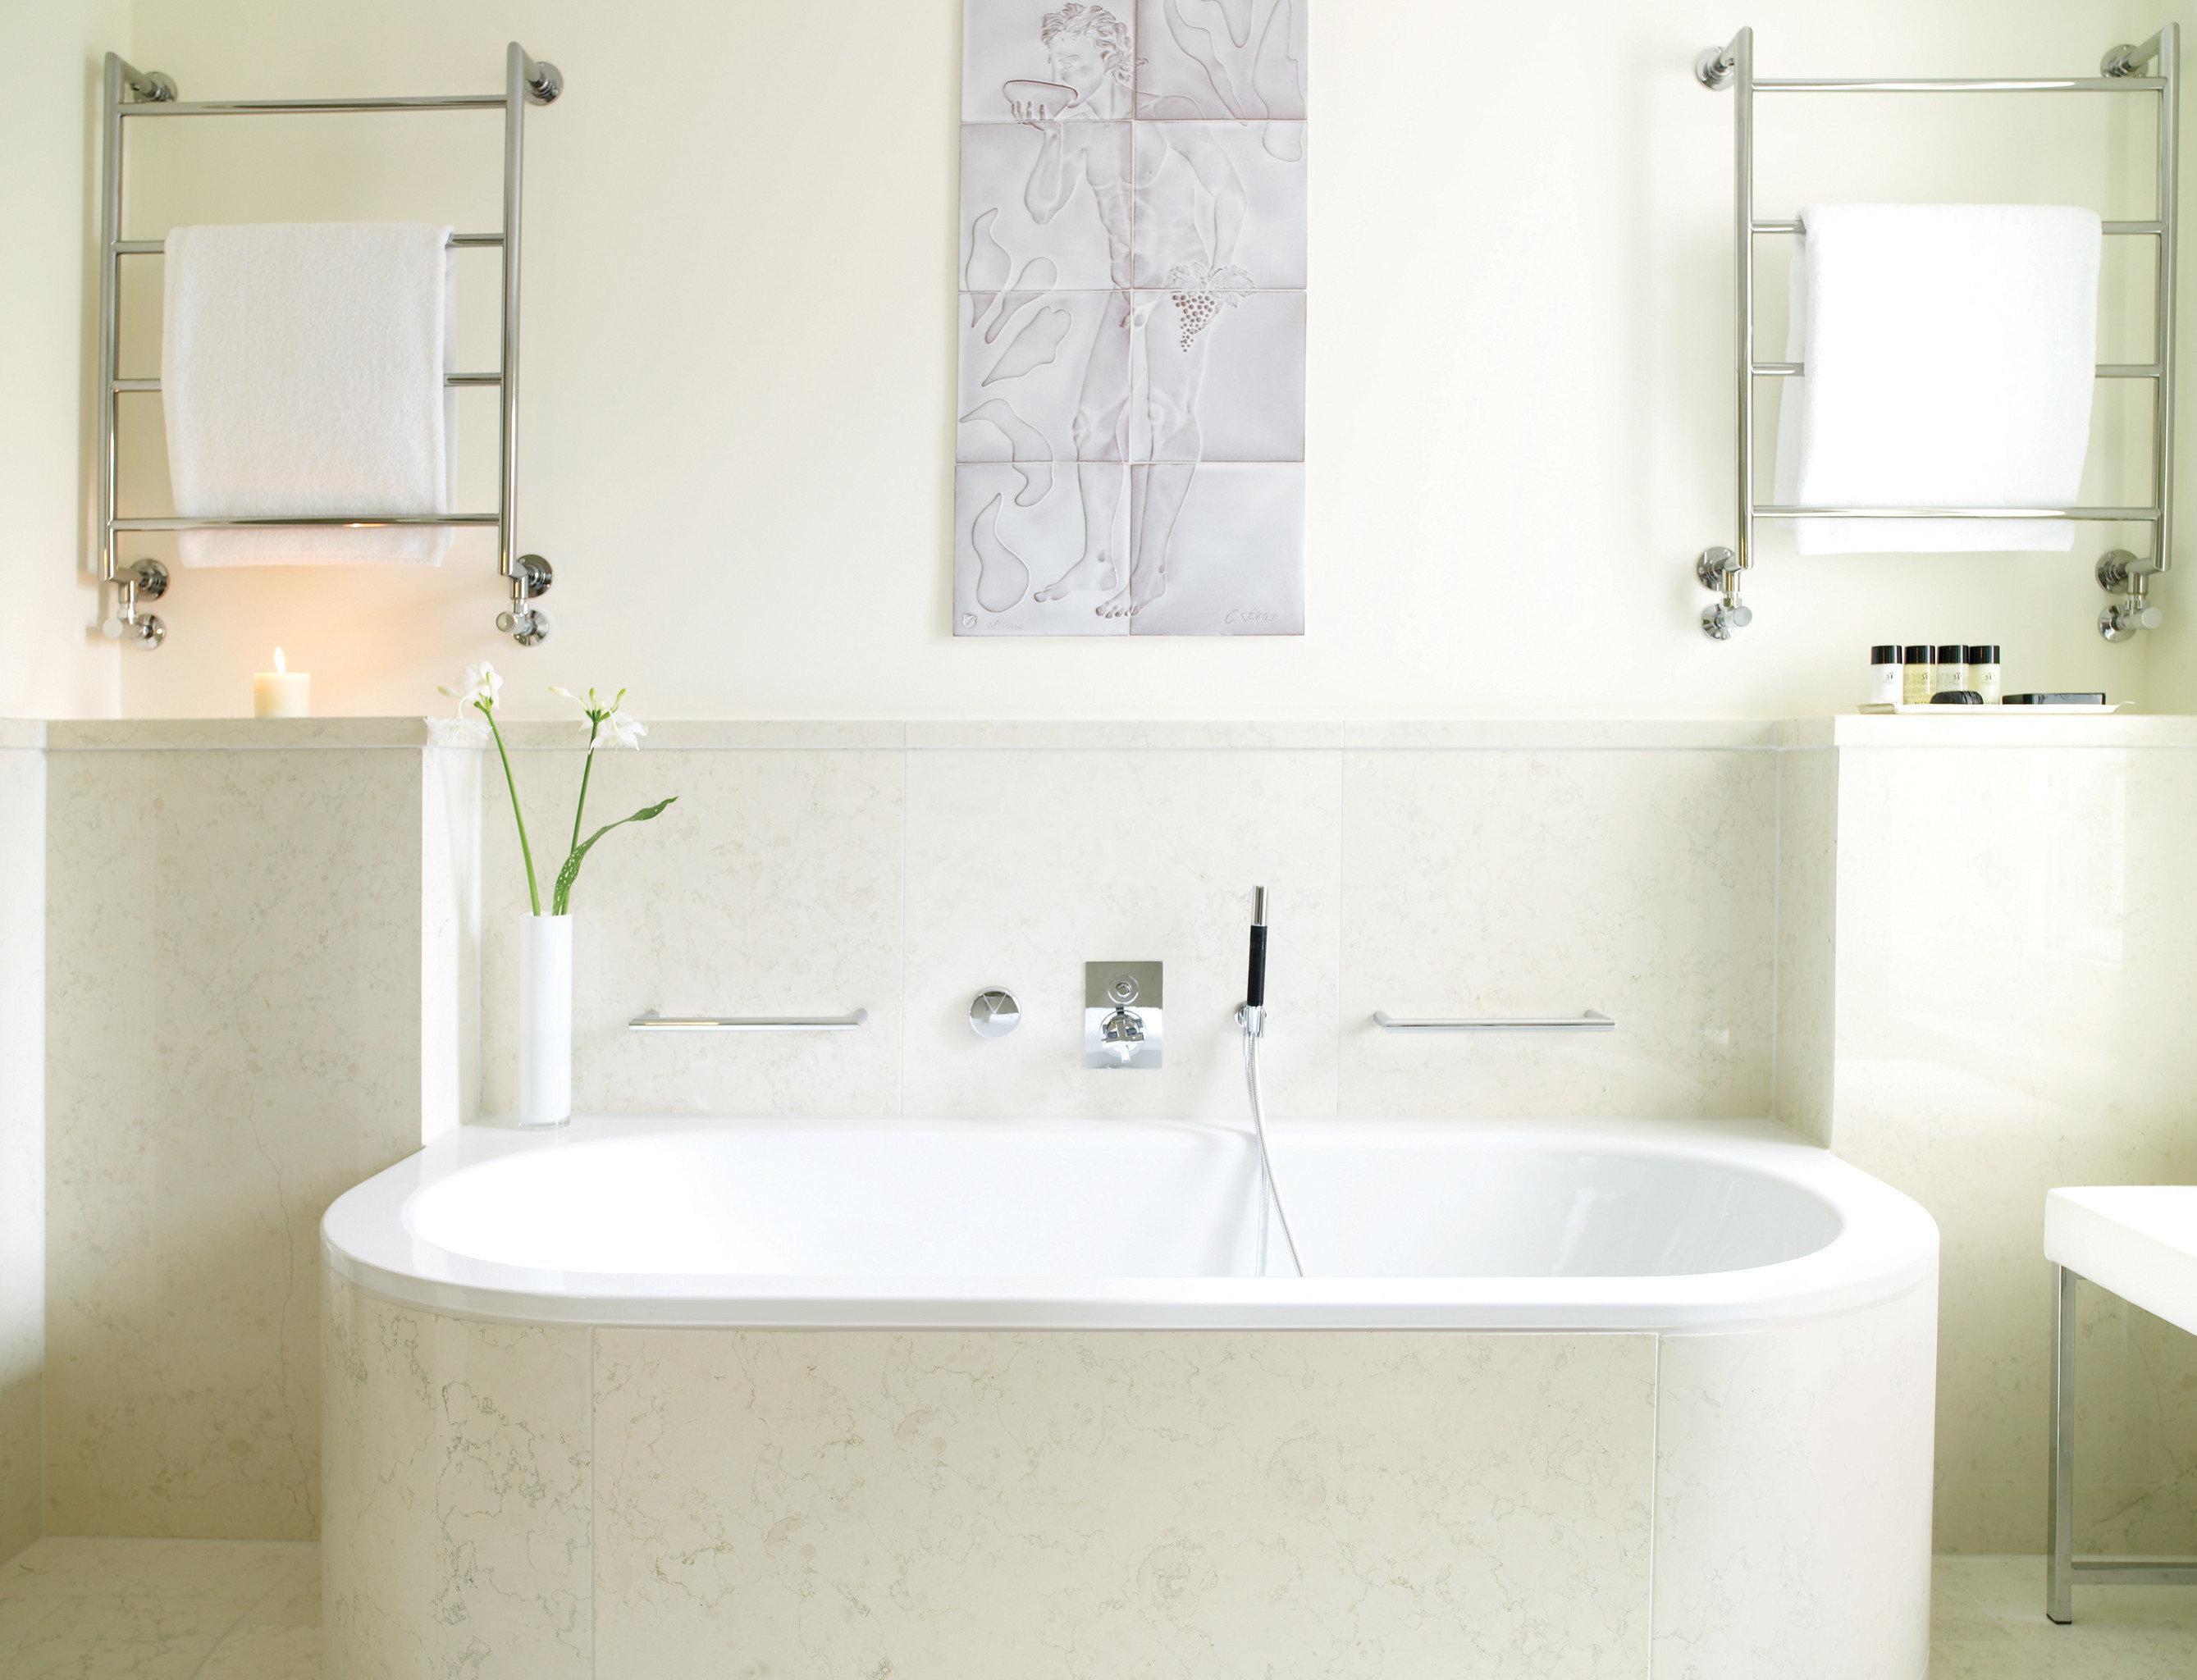 europe Germany Hotels Munich indoor wall bathroom room white vessel bathtub plumbing fixture bidet toilet floor sink interior design bathroom cabinet tub flooring Bath tile water basin tiled